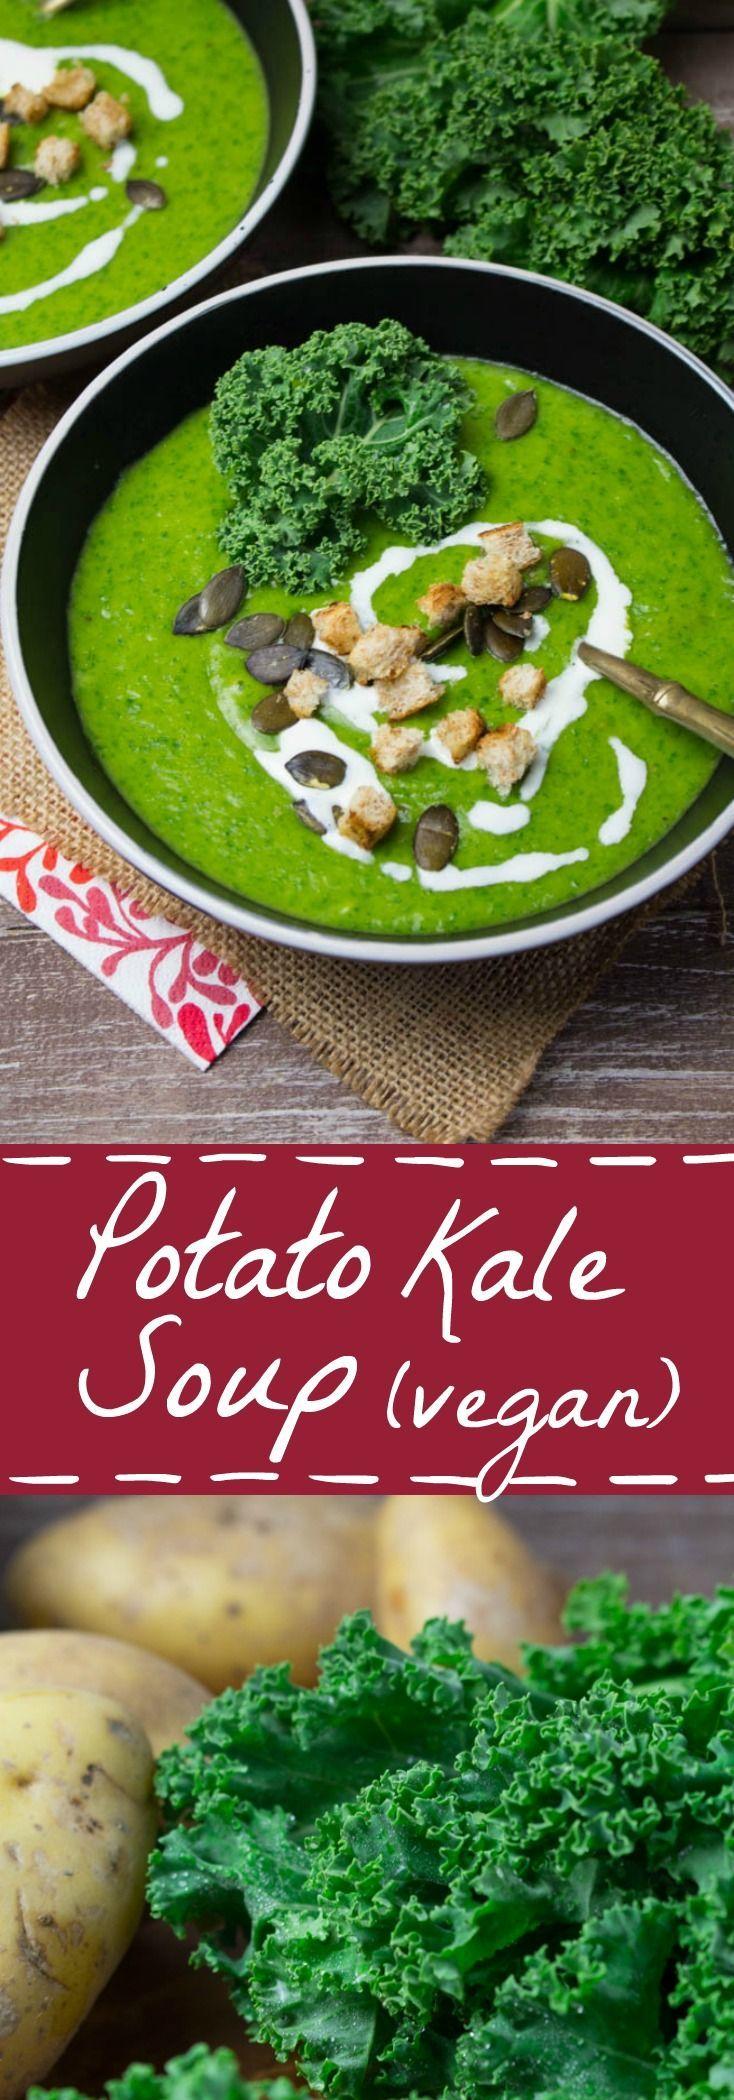 Vegan potato kale soup with celery, carrots, and leek